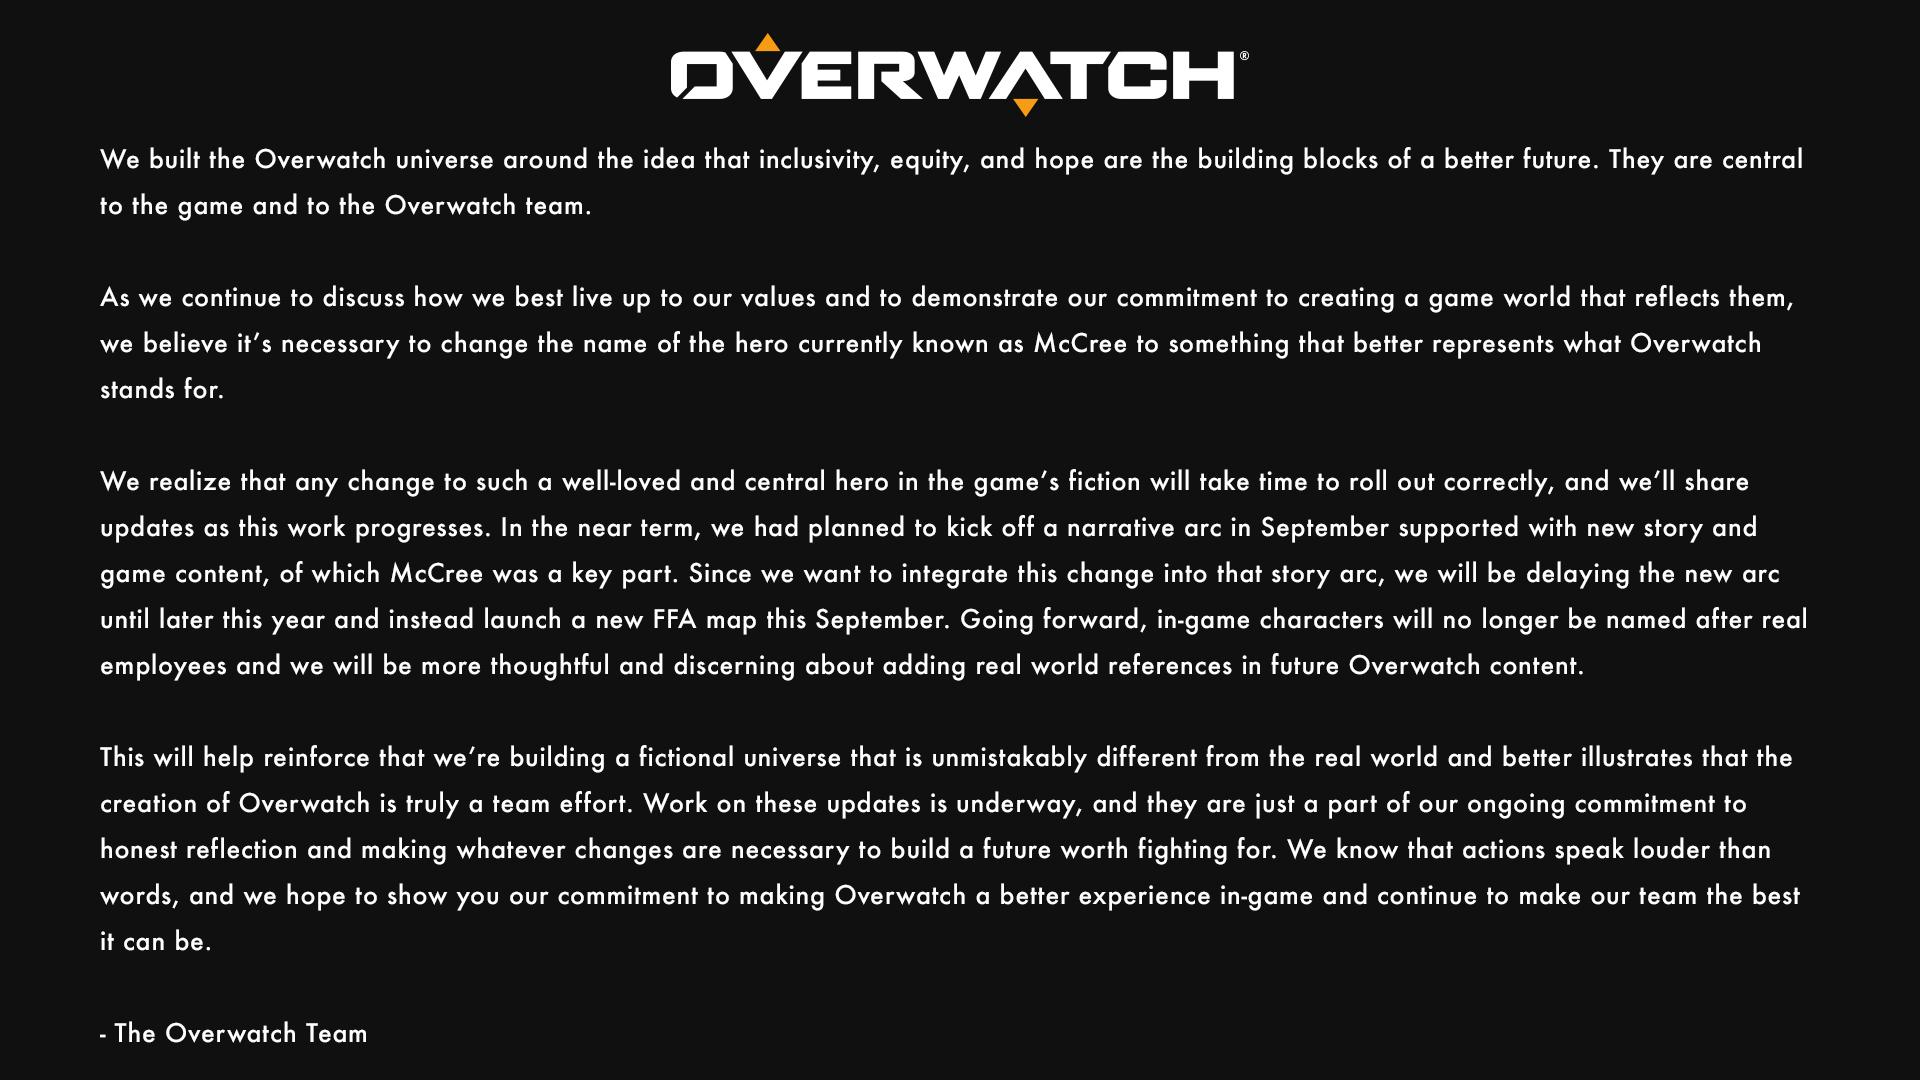 Blizzard's statement in full.